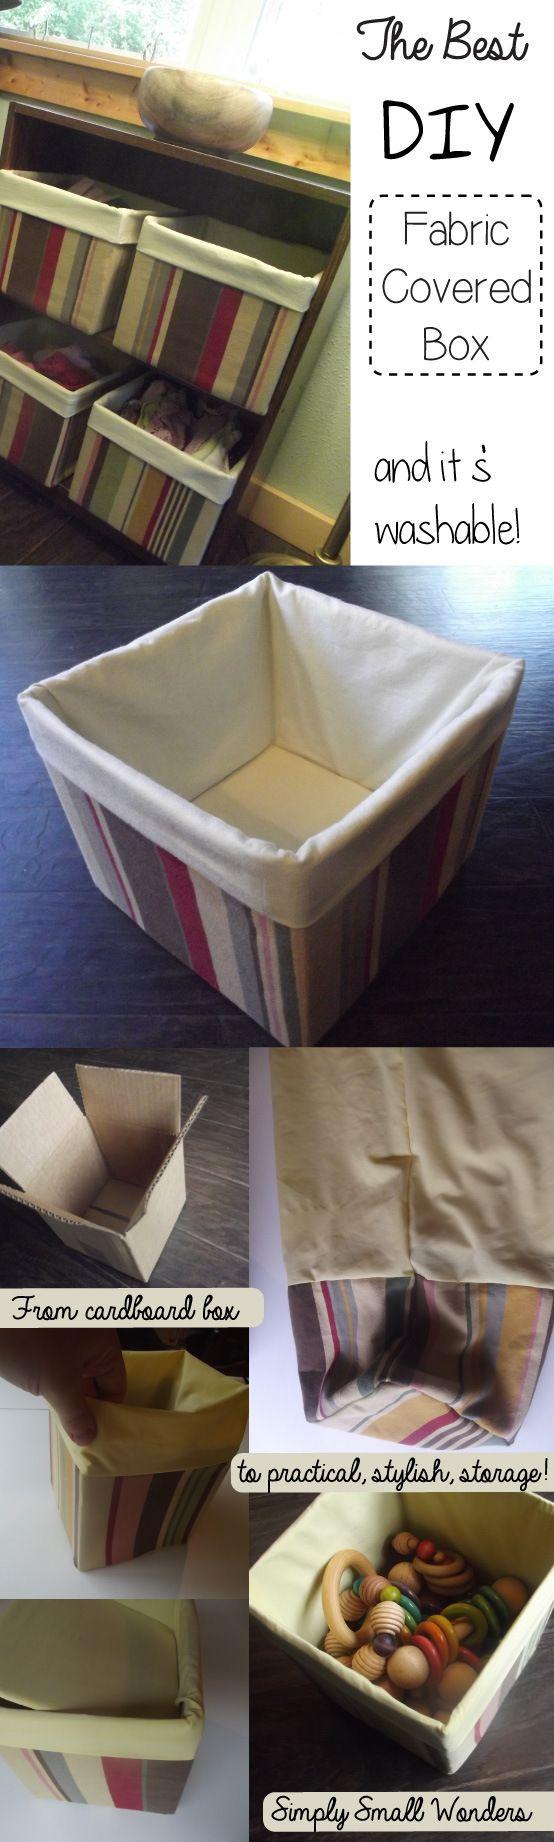 Fundas de tela para cajas de cartón- Tutorial